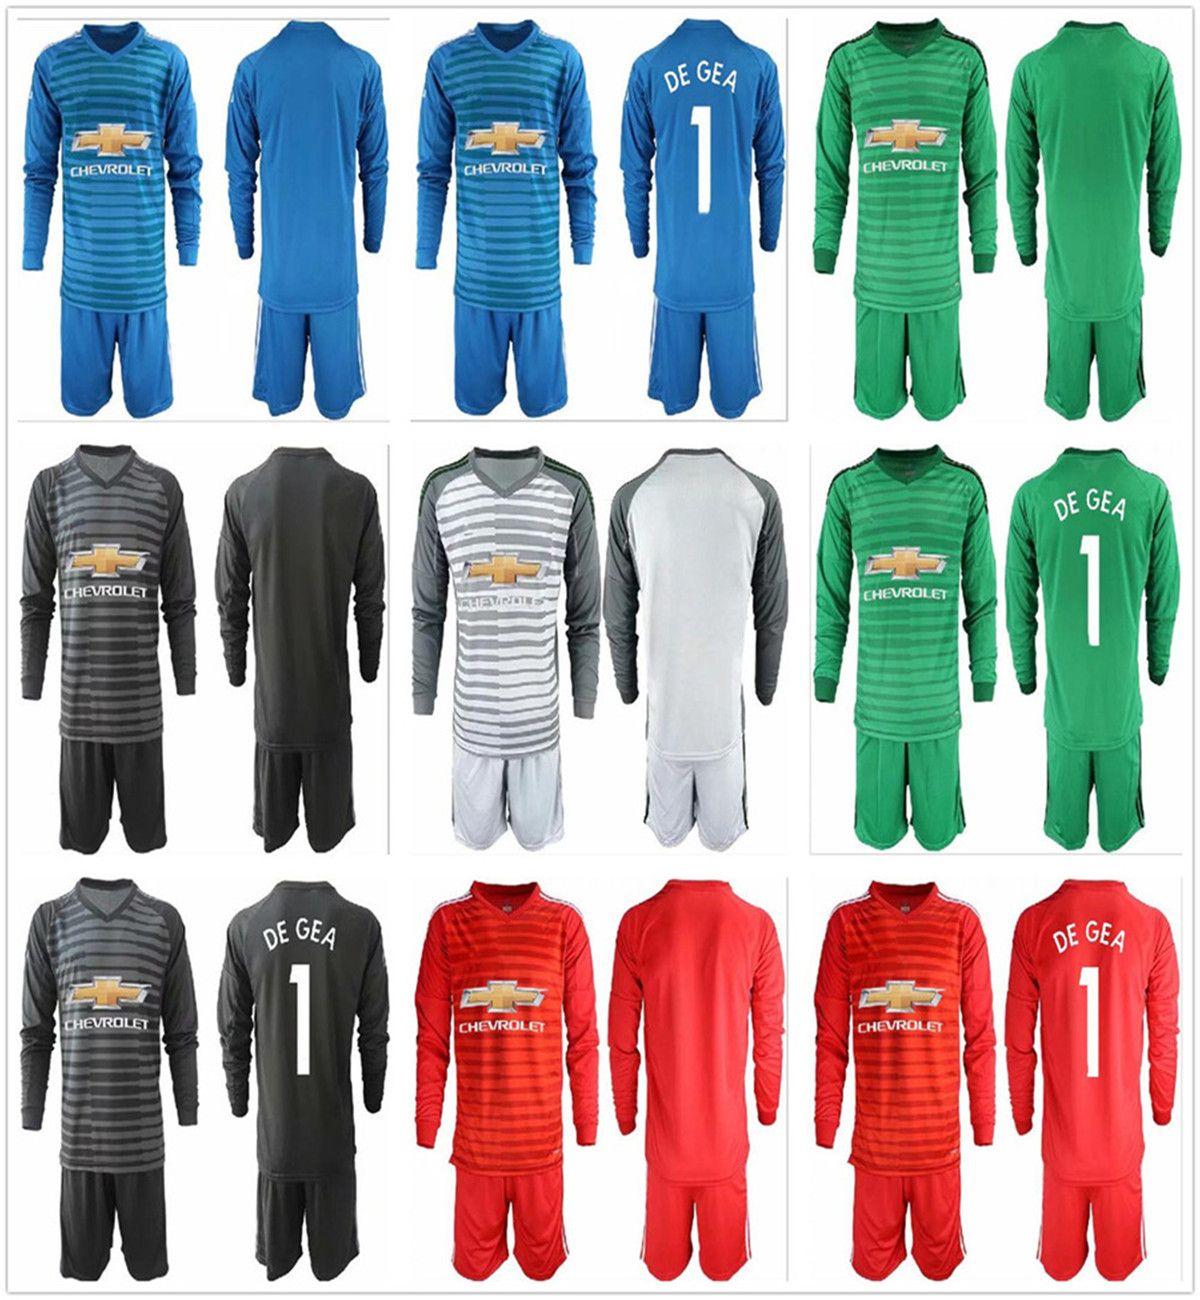 new concept 6e951 8498c 2018 2019 Men Long Goalkeeper Adults Kit Goalkeeper Soccer Sets #1 David De  Gea 22 S.Romero Goalie Adult Full Football Jersey Uniform Set